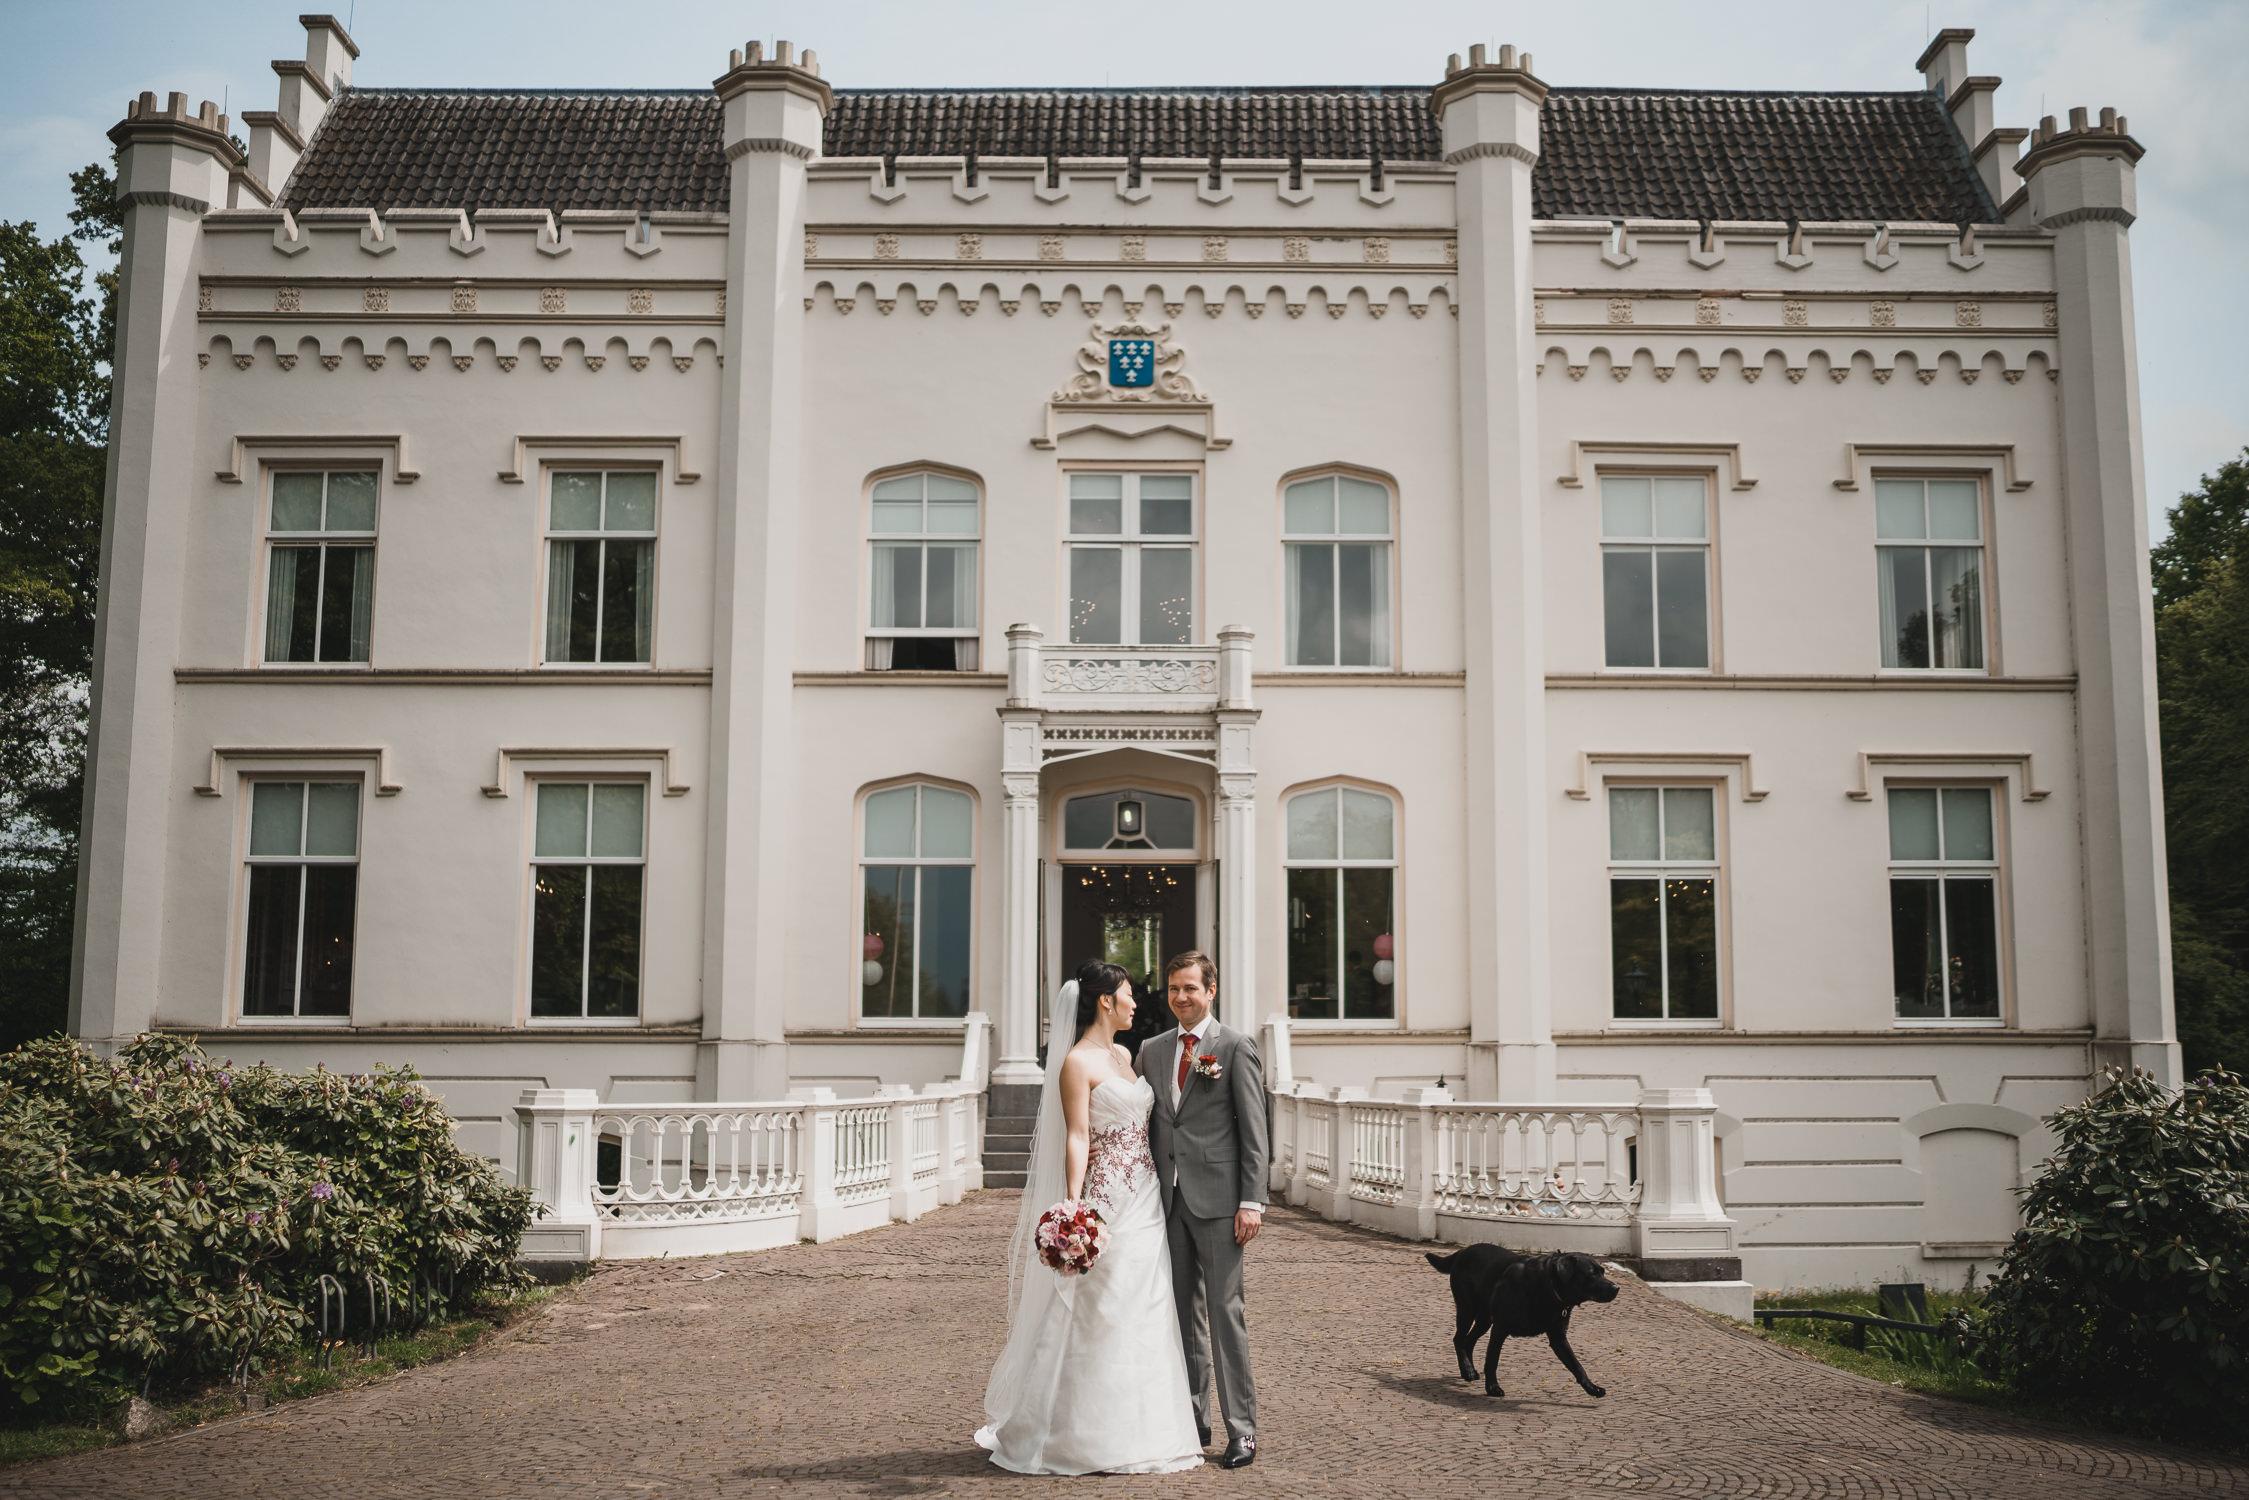 bruidsfotografie-amsterdam-utrecht-trouwfotograaf-mark-hadden-wedding-photography-Yun & Geert-052.jpg